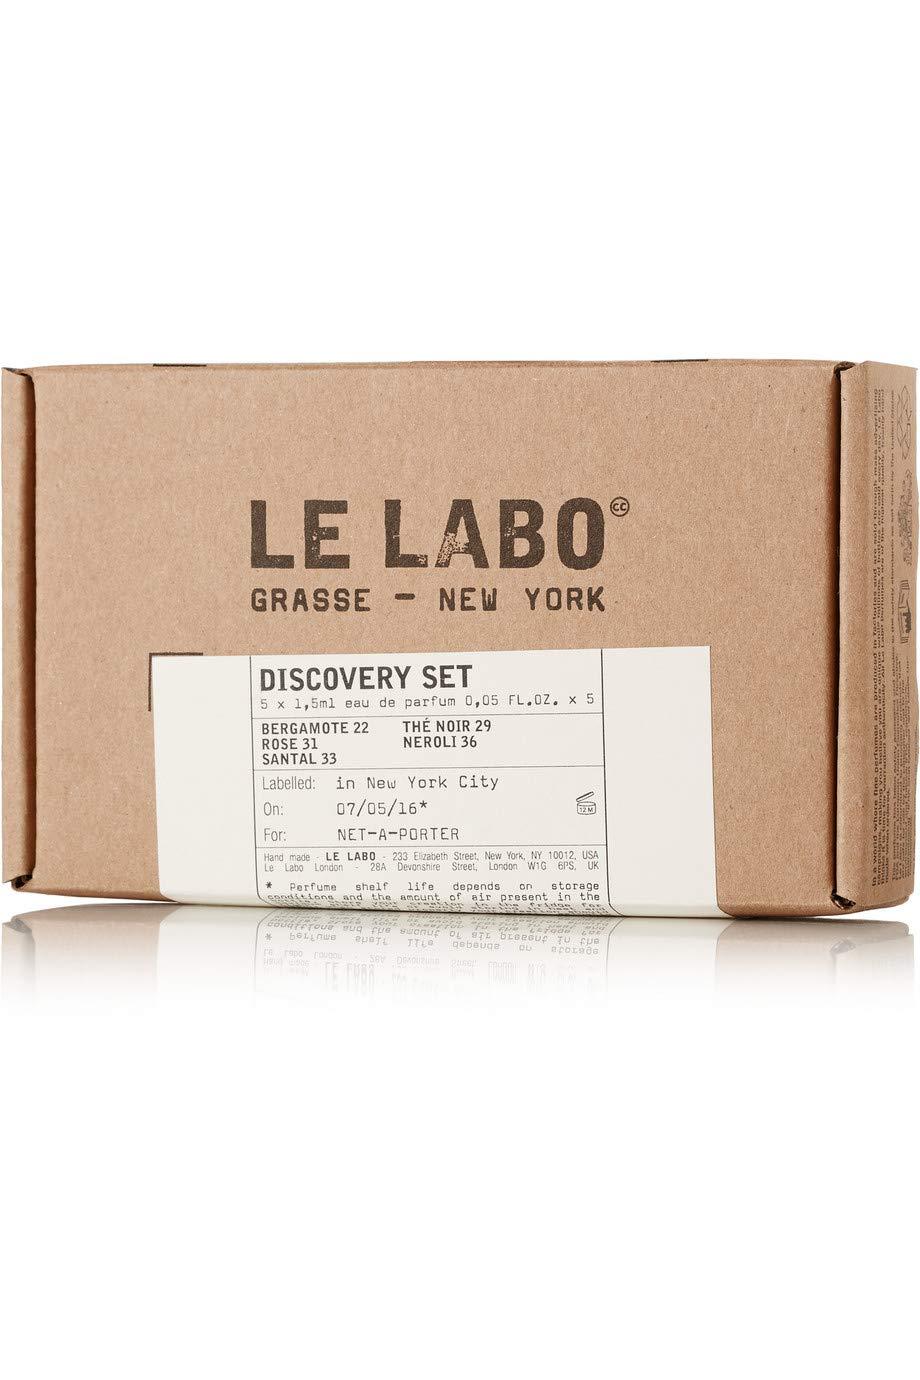 Le Labo Discovery Set Santal 33, Rose 31, Bergamote 22, Neroli 36 & The Noir 29 Sampler - .05 oz. Each by Le Labo